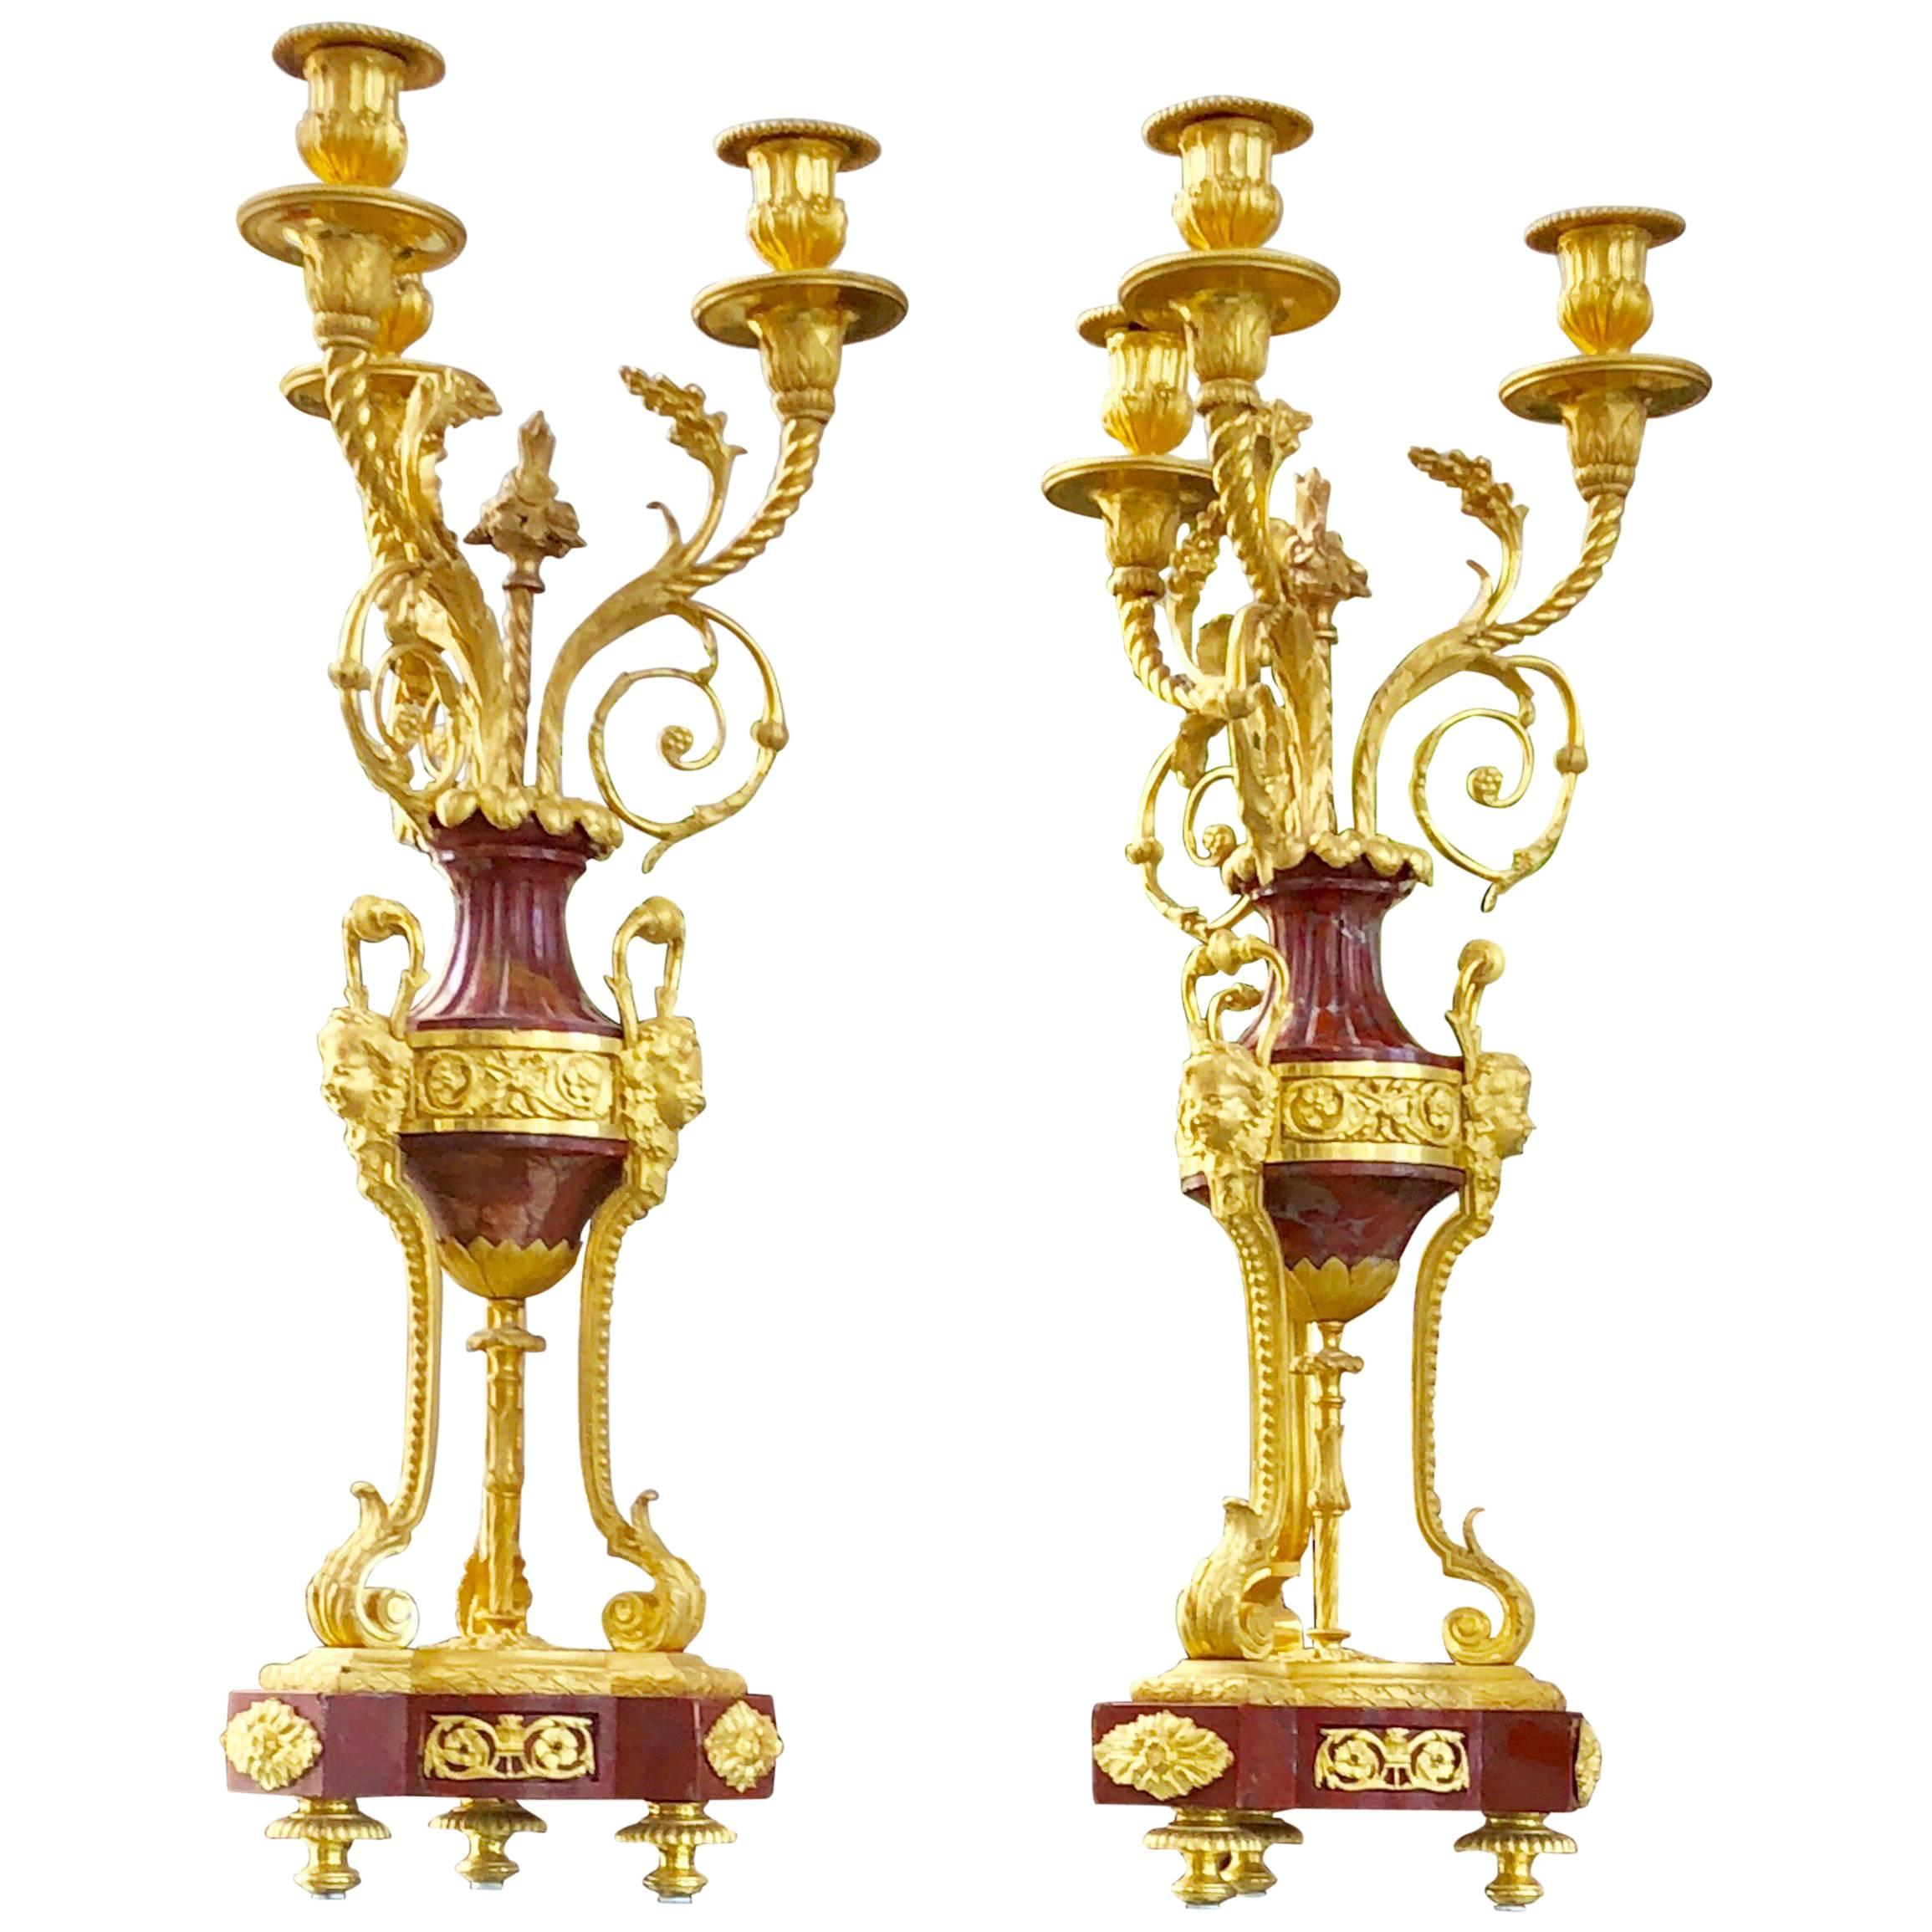 Pair of Louis XVI Candelabra